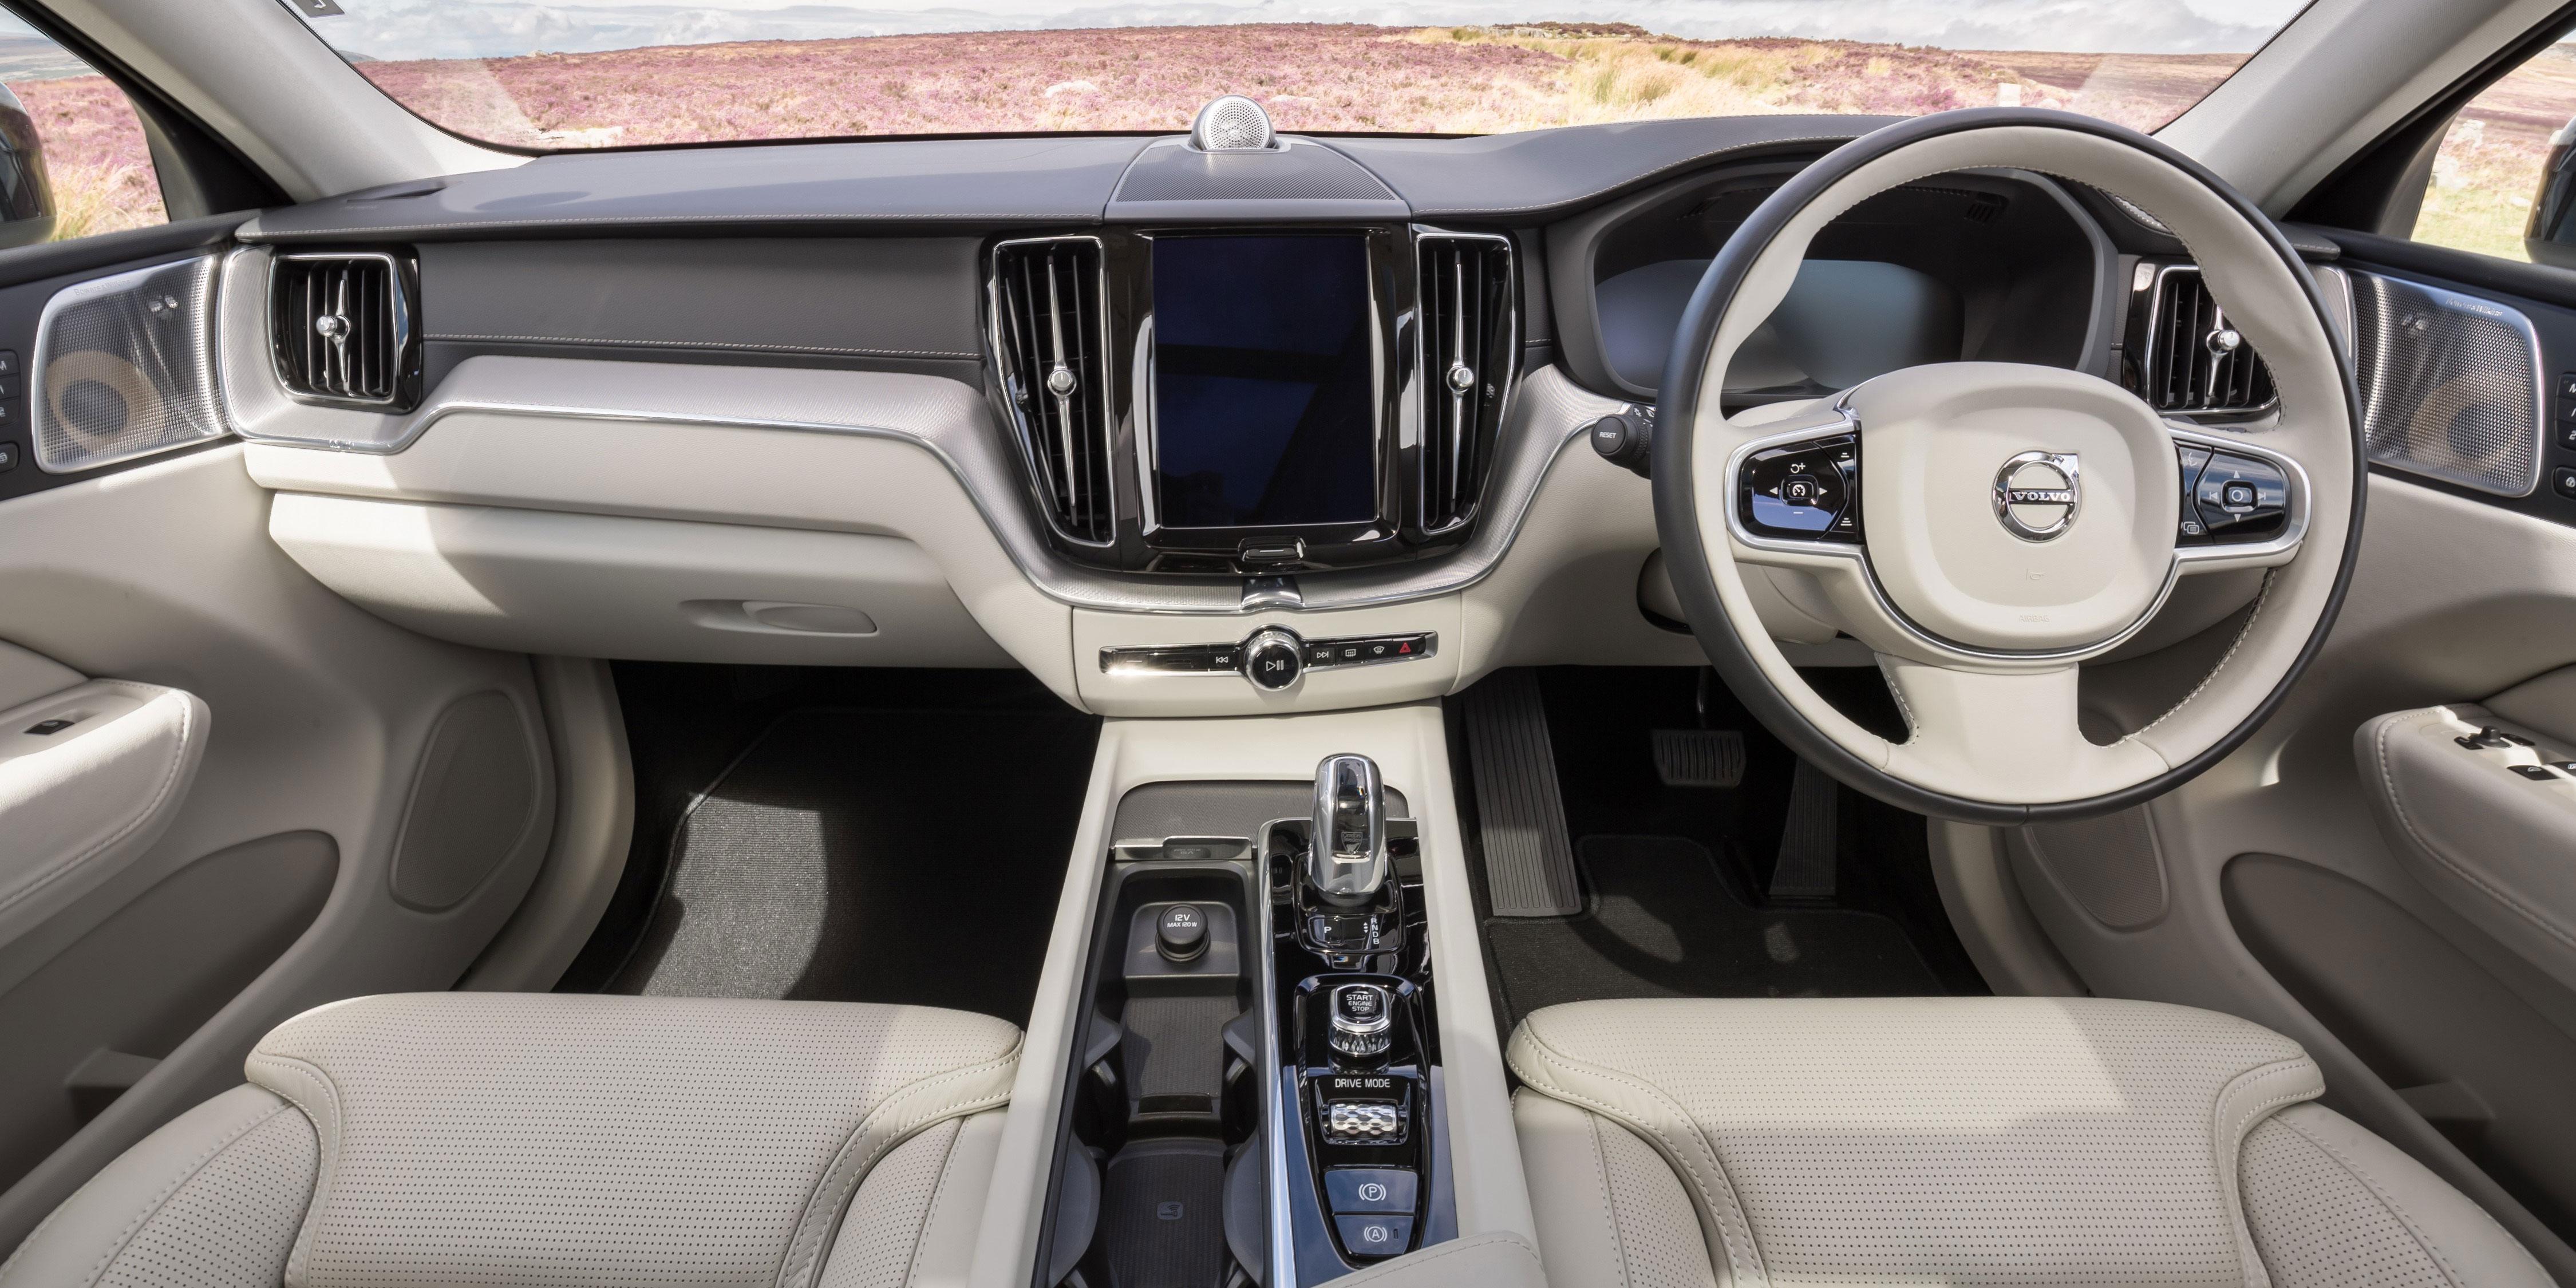 Volvo Xc60 Interior Infotainment Carwow